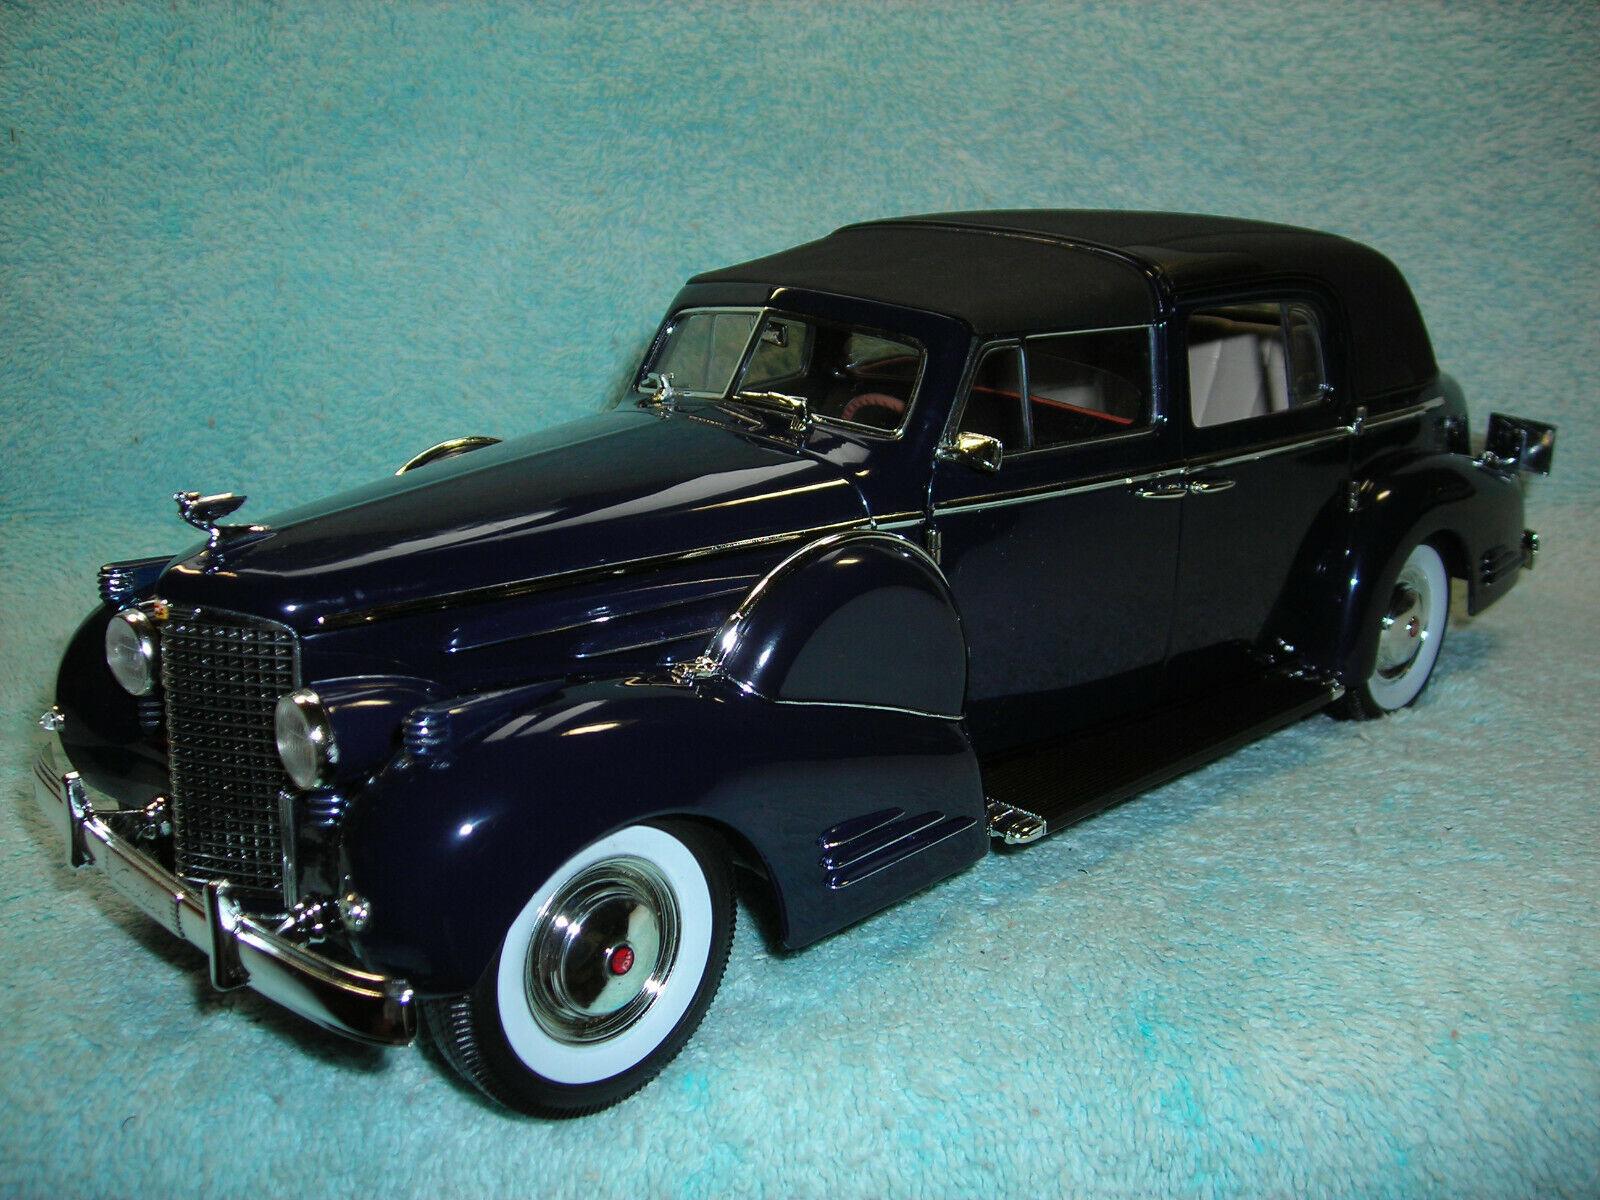 1 18 SCALE 1938 CADILLAC FLEETWOOD TOWN CAR V-16 IN DARK Blau BY SIGNATURE.